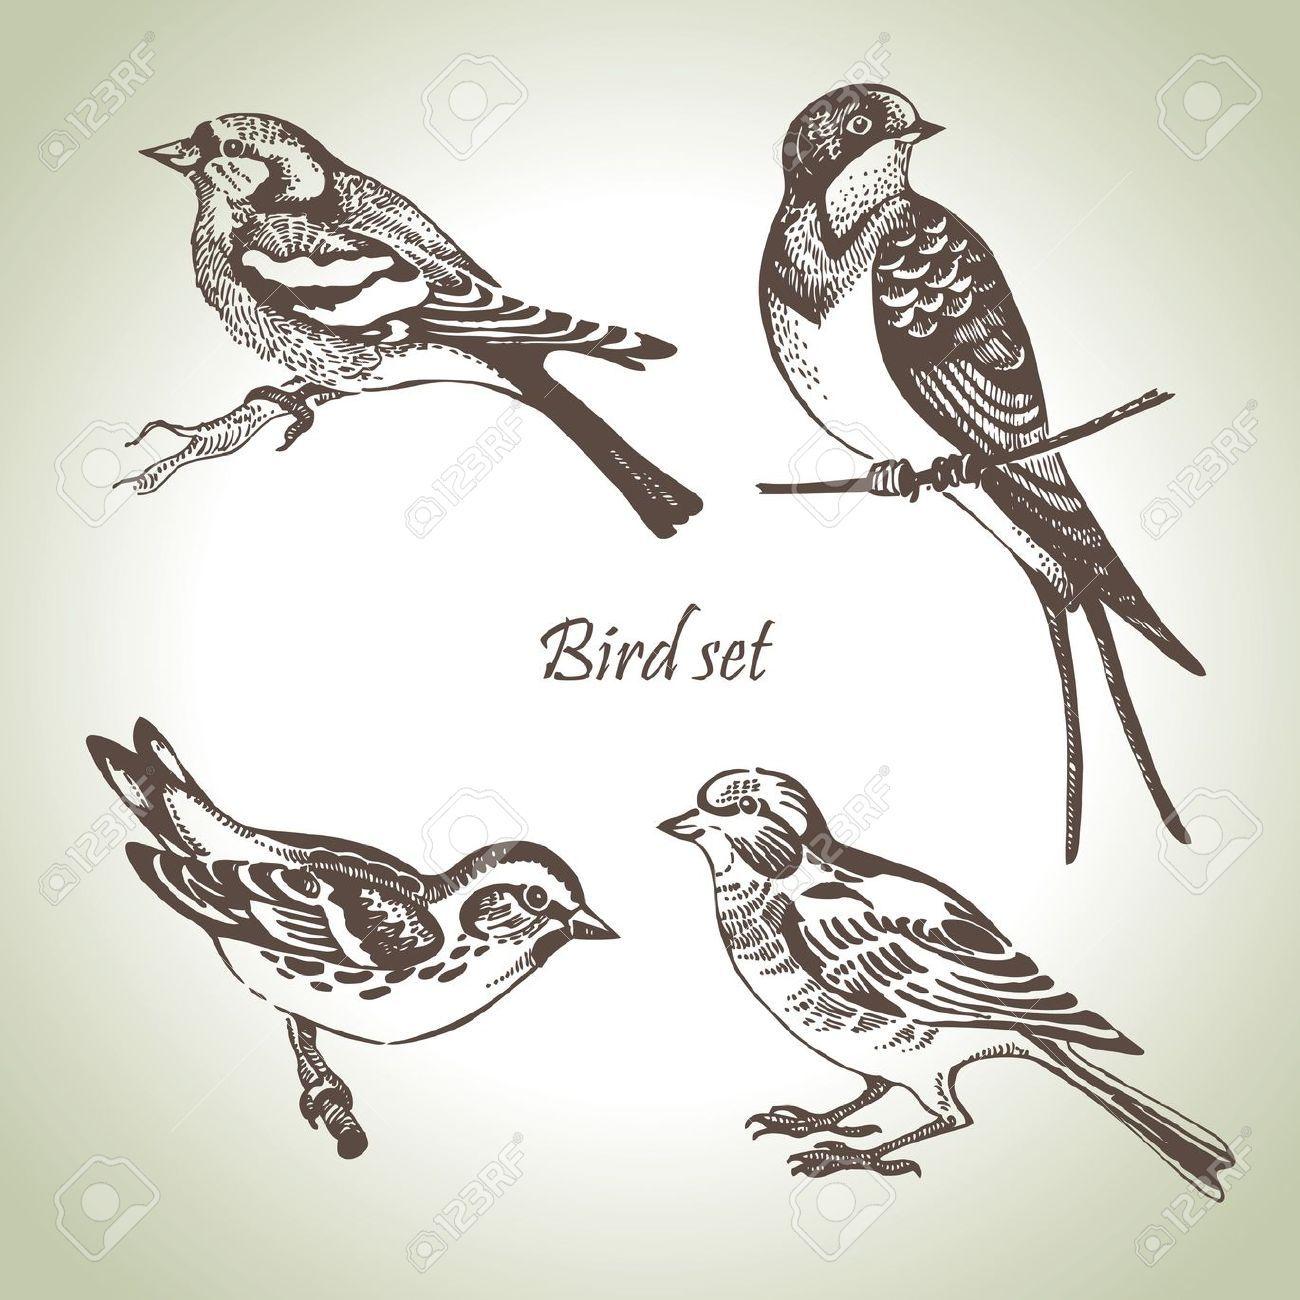 Summer beach scene vector stock vector colourbox - Bird Set Hand Drawn Illustration Stock Vector On Colourbox